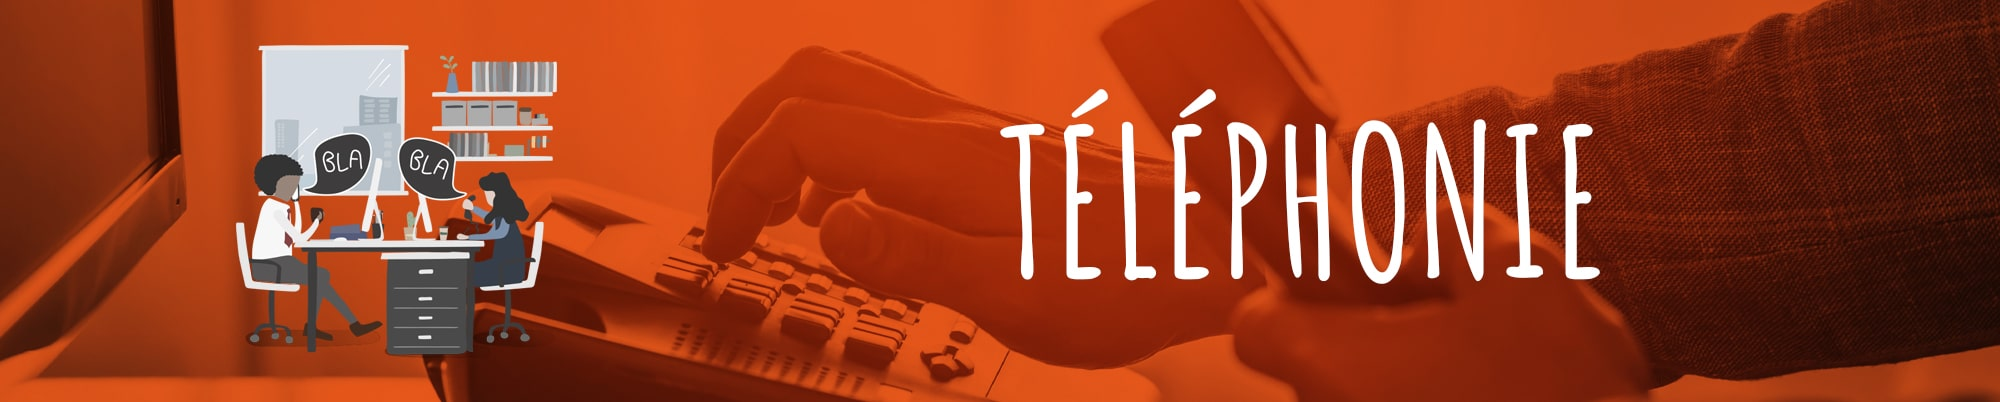 Header-rubriques-telephonie-infodeos XL